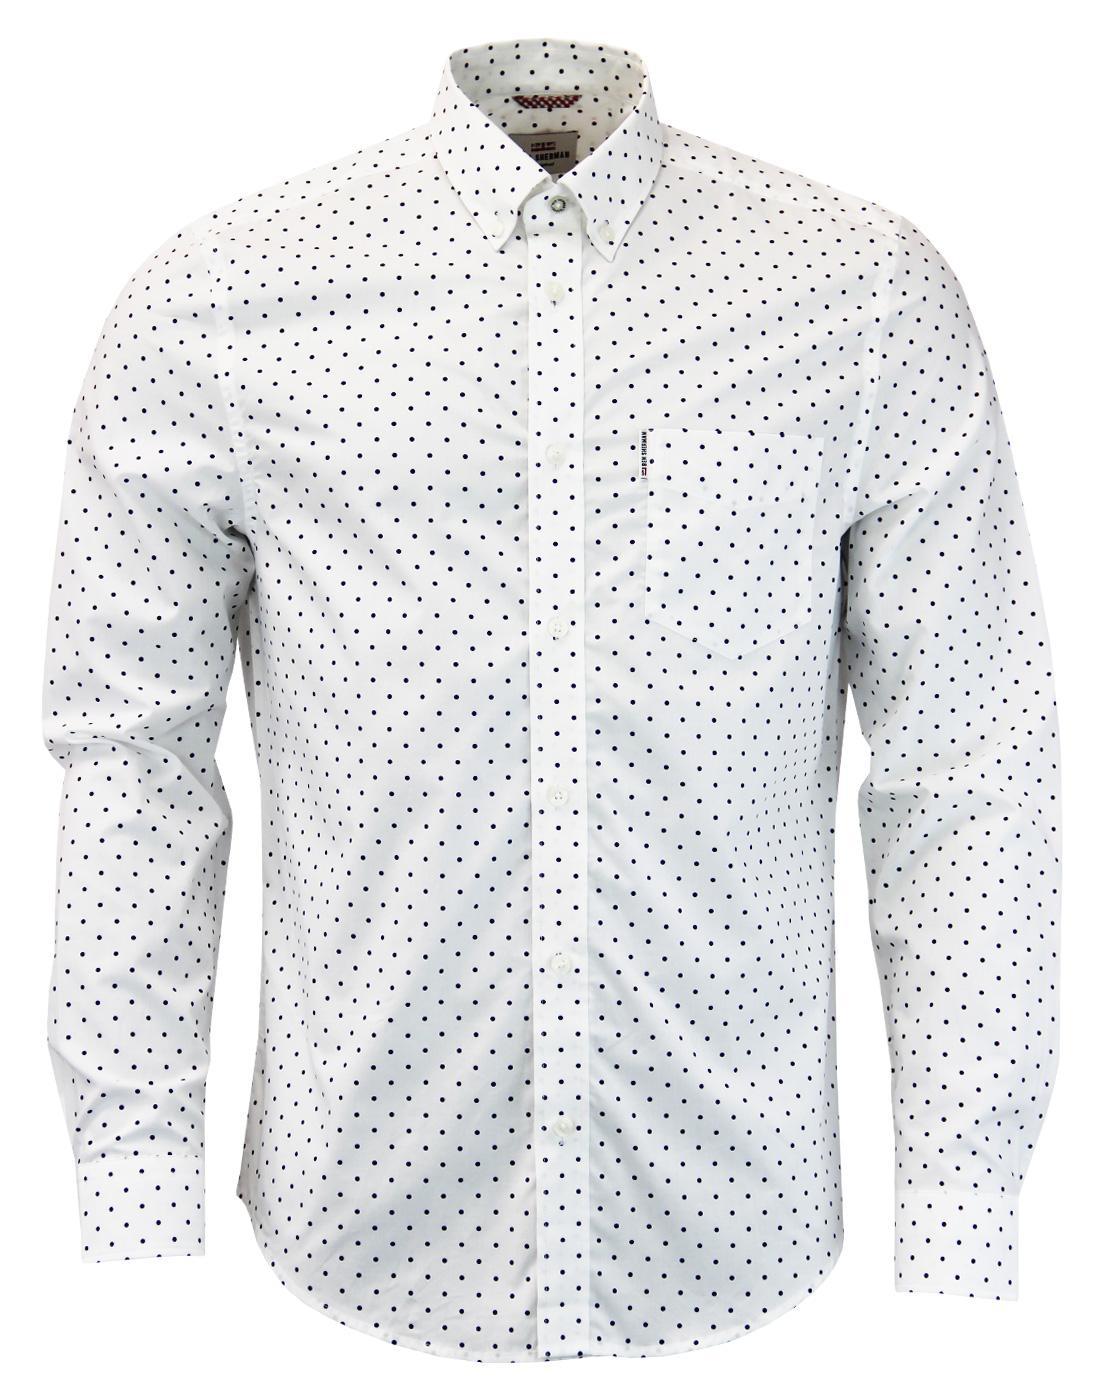 BEN SHERMAN 1960s Mod Classic Polka Dot Shirt (W)